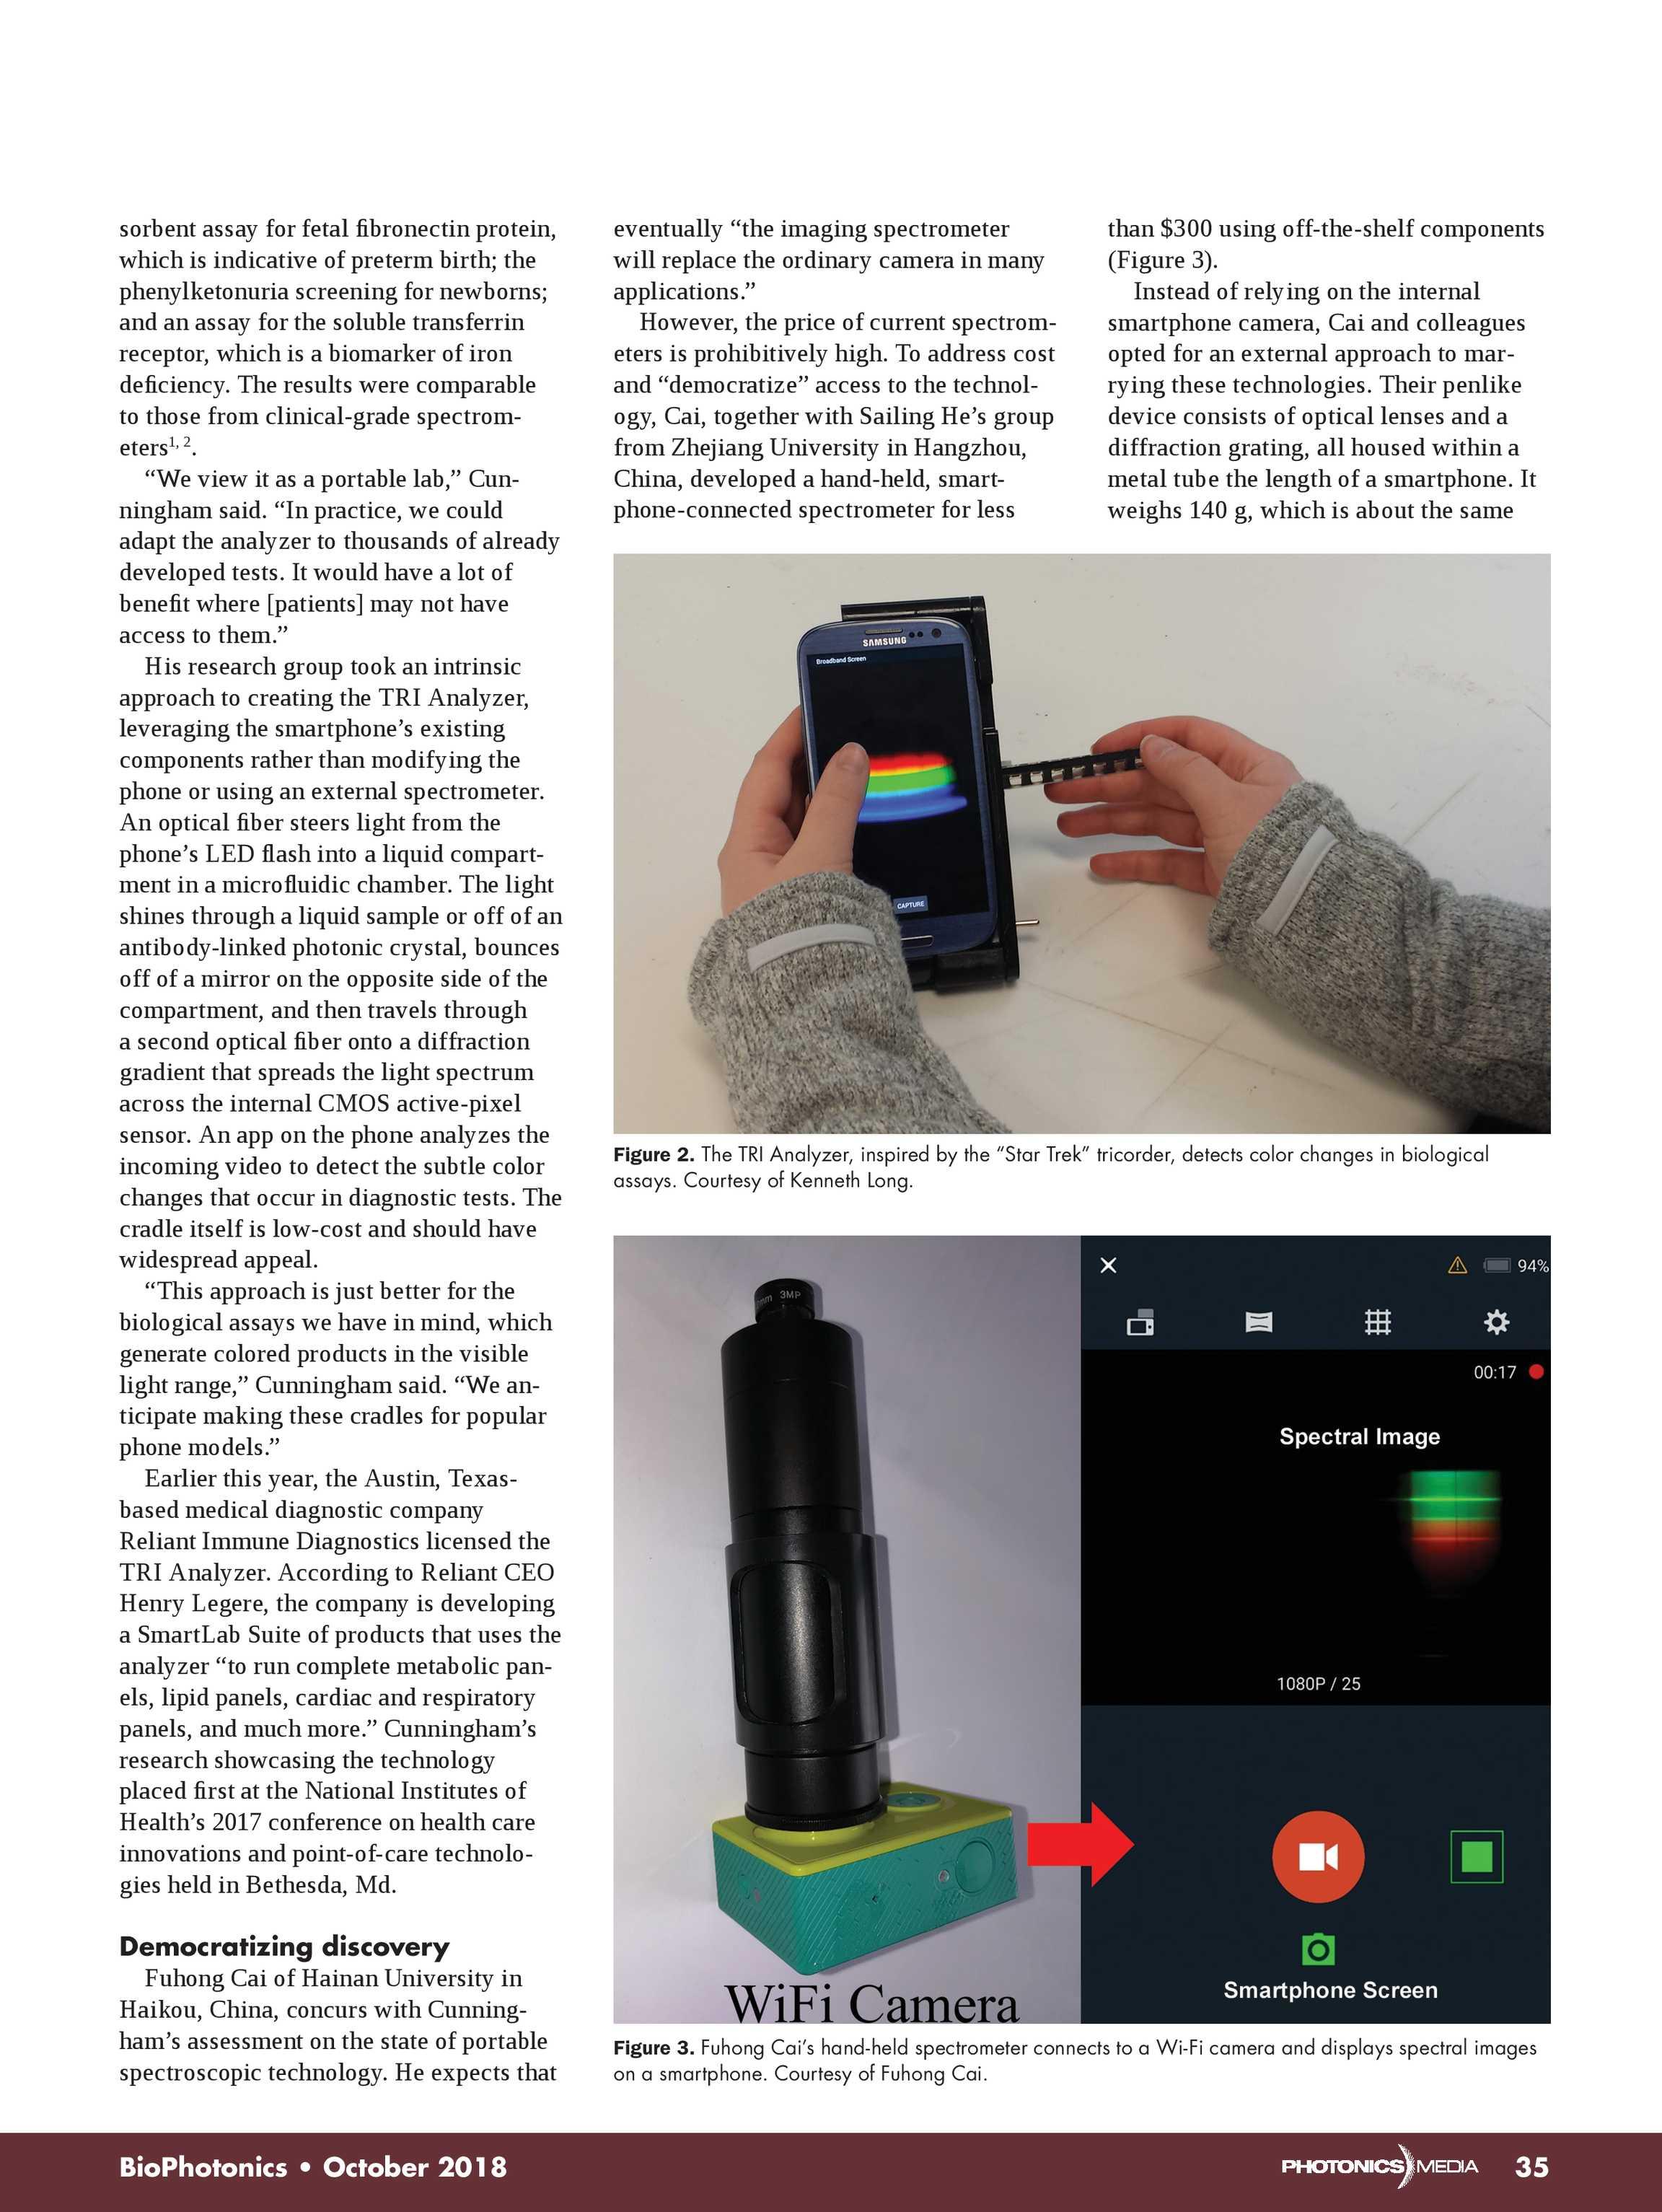 Bio Photonics - October 2018 - page 34